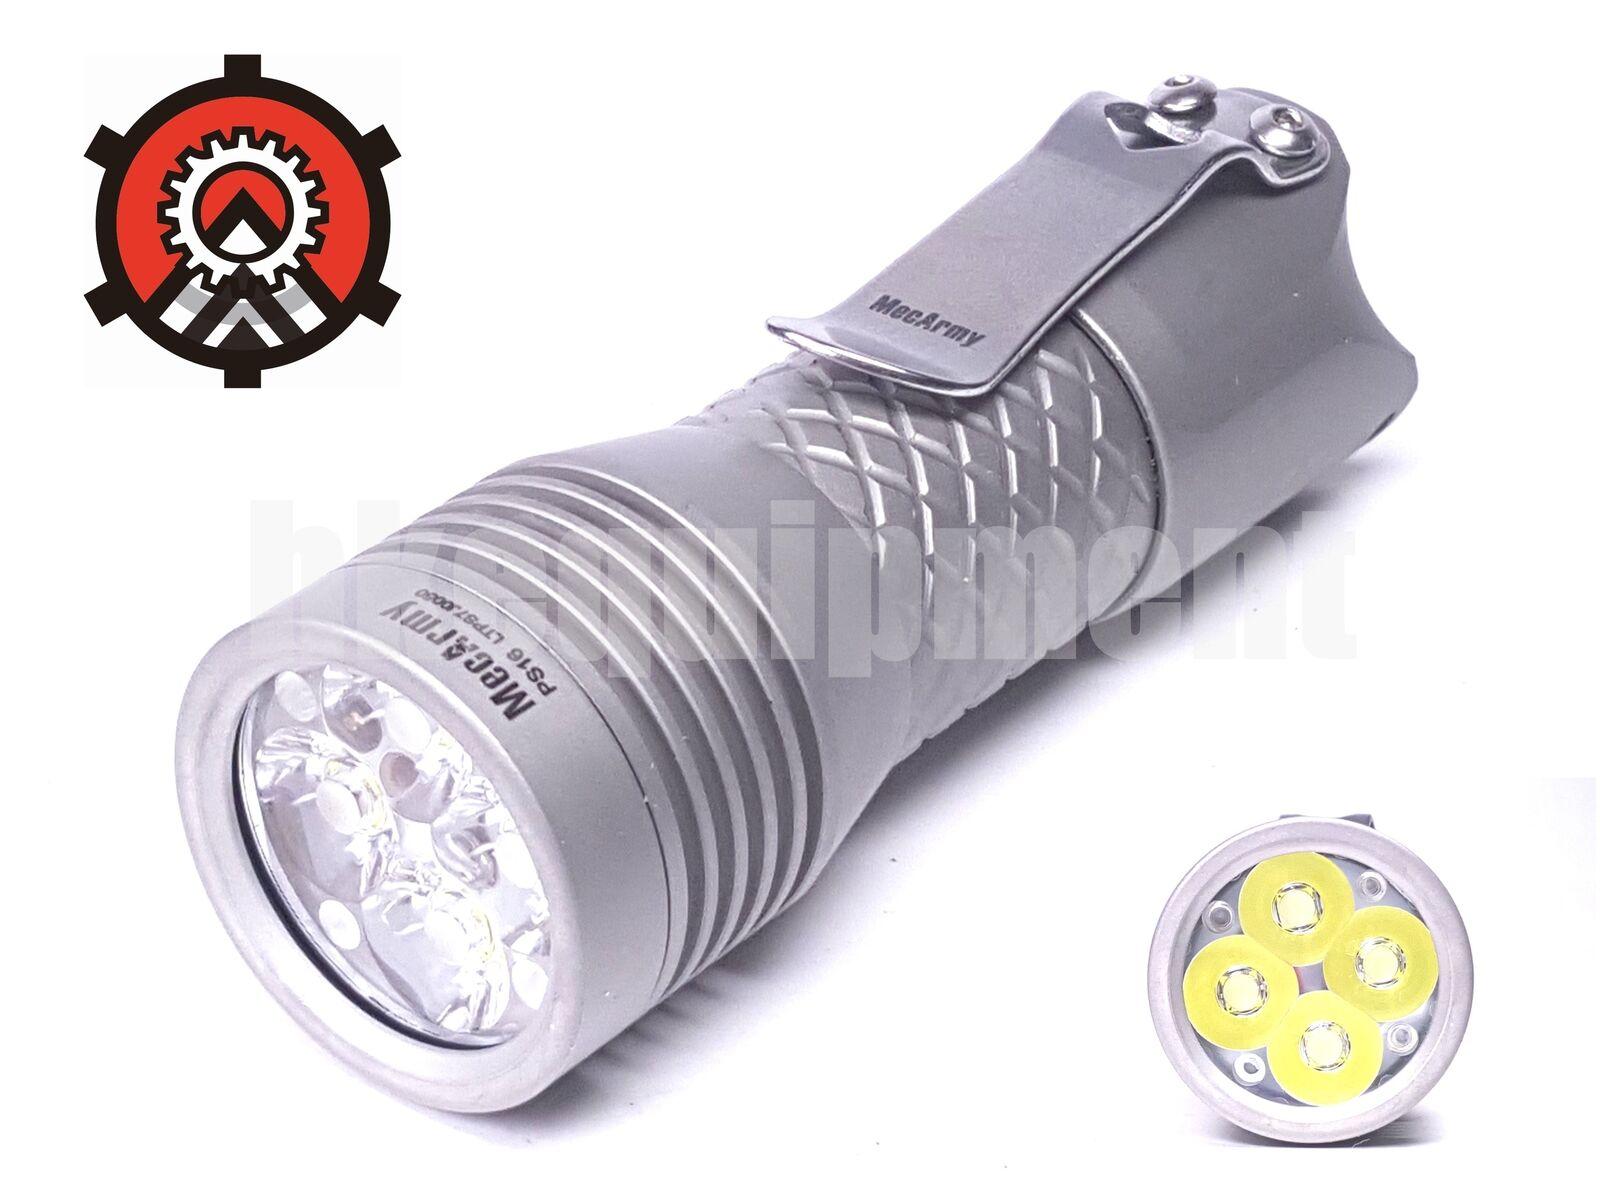 Mecarmy PS16 4x Cree XP-G3 S5 2000lm Flashlight Matt+USB Rechargeable Battery